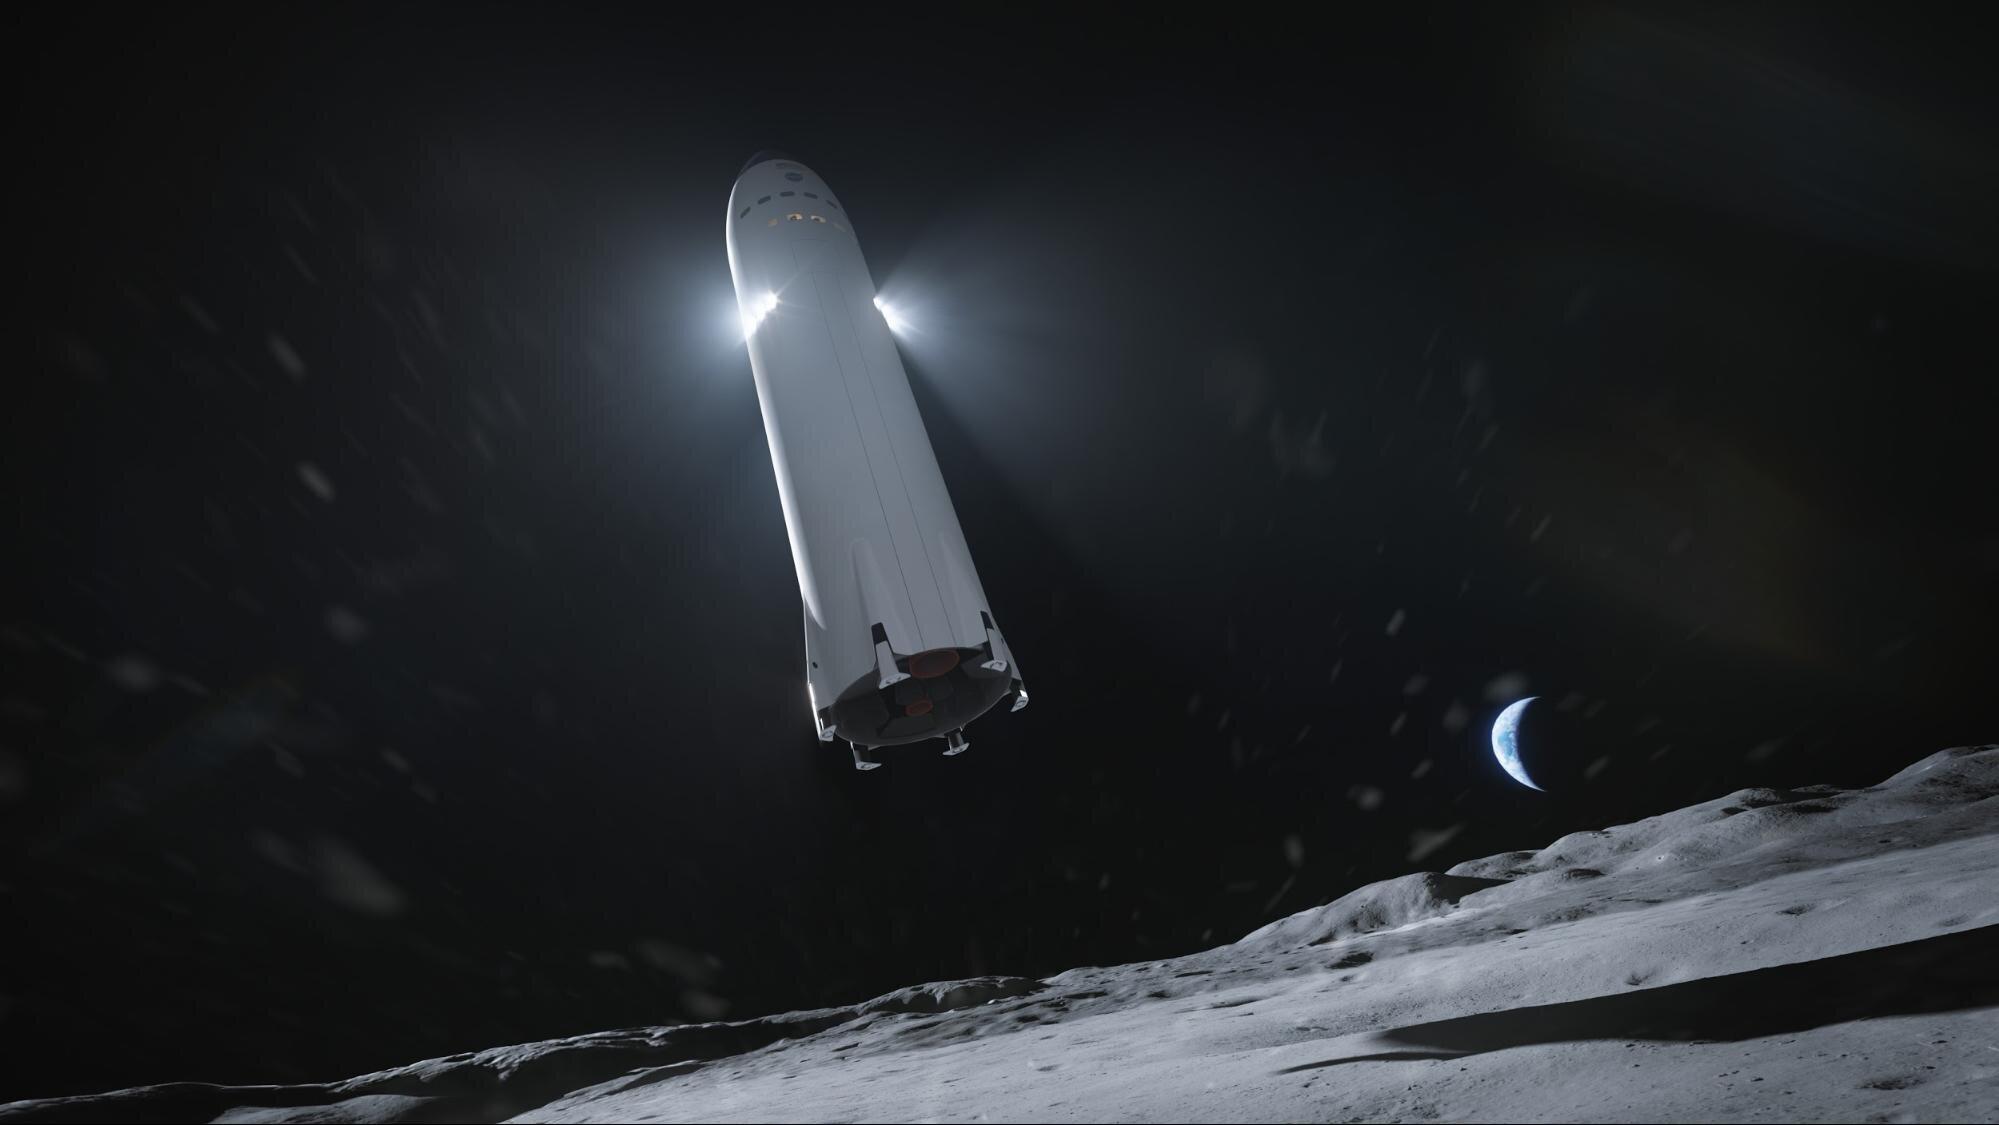 SpaceX Human Lunar Lander Starship. Source: SpaceX.